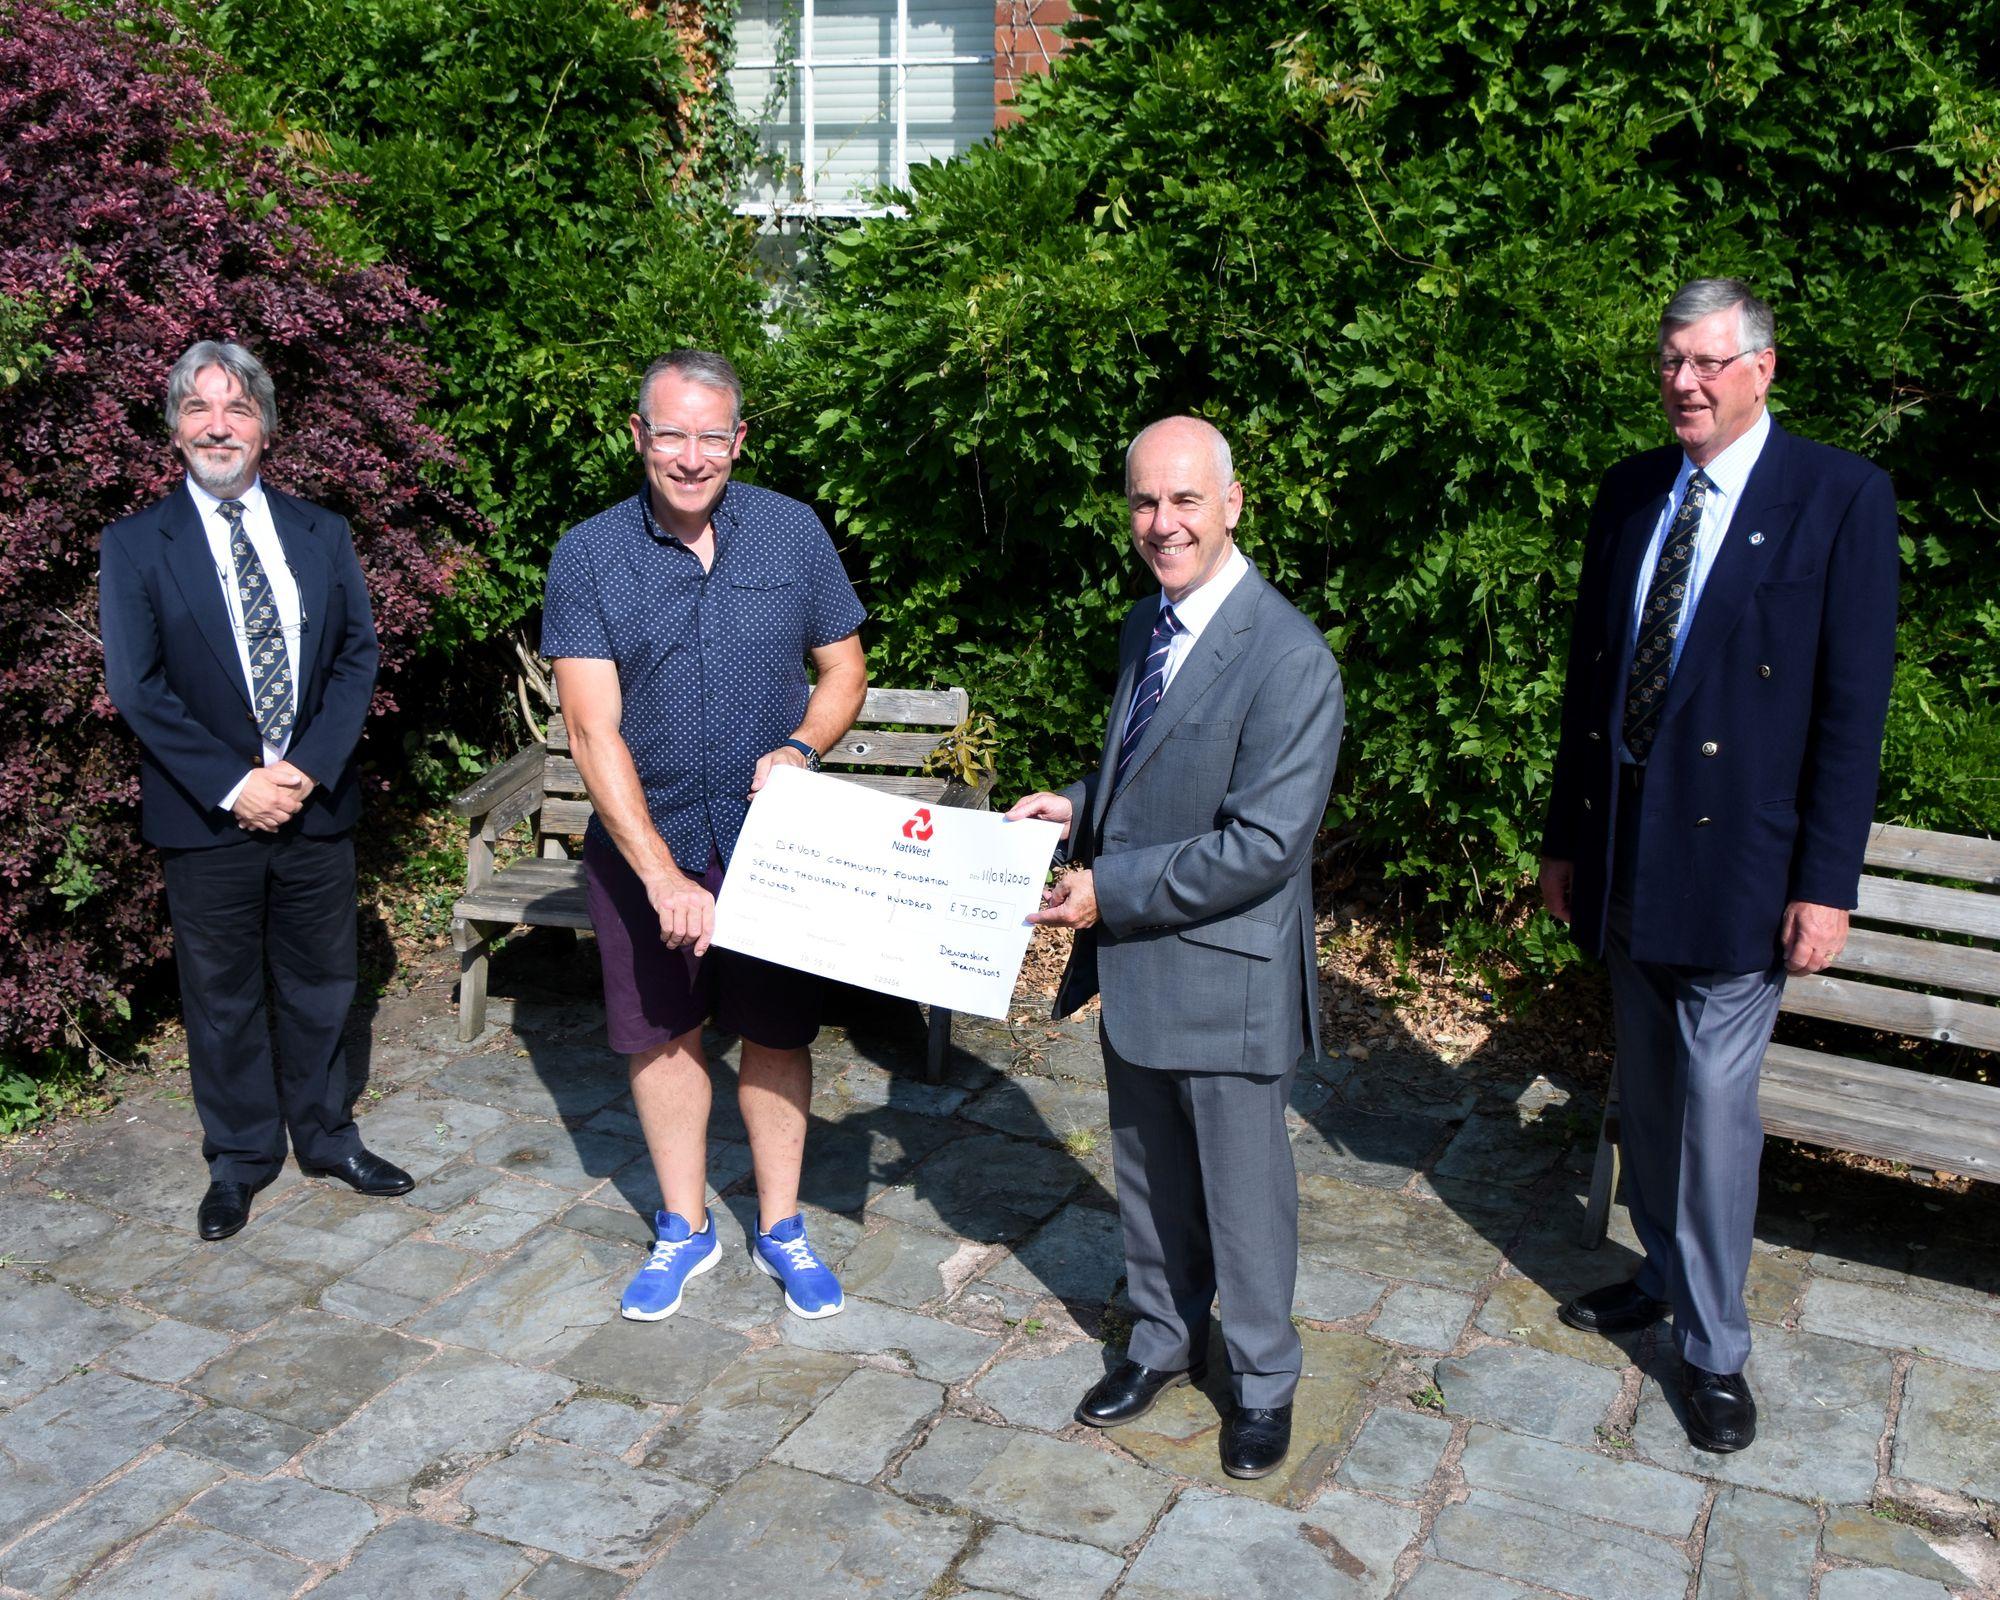 England - Freemasons donate thousands to help causes across Devon